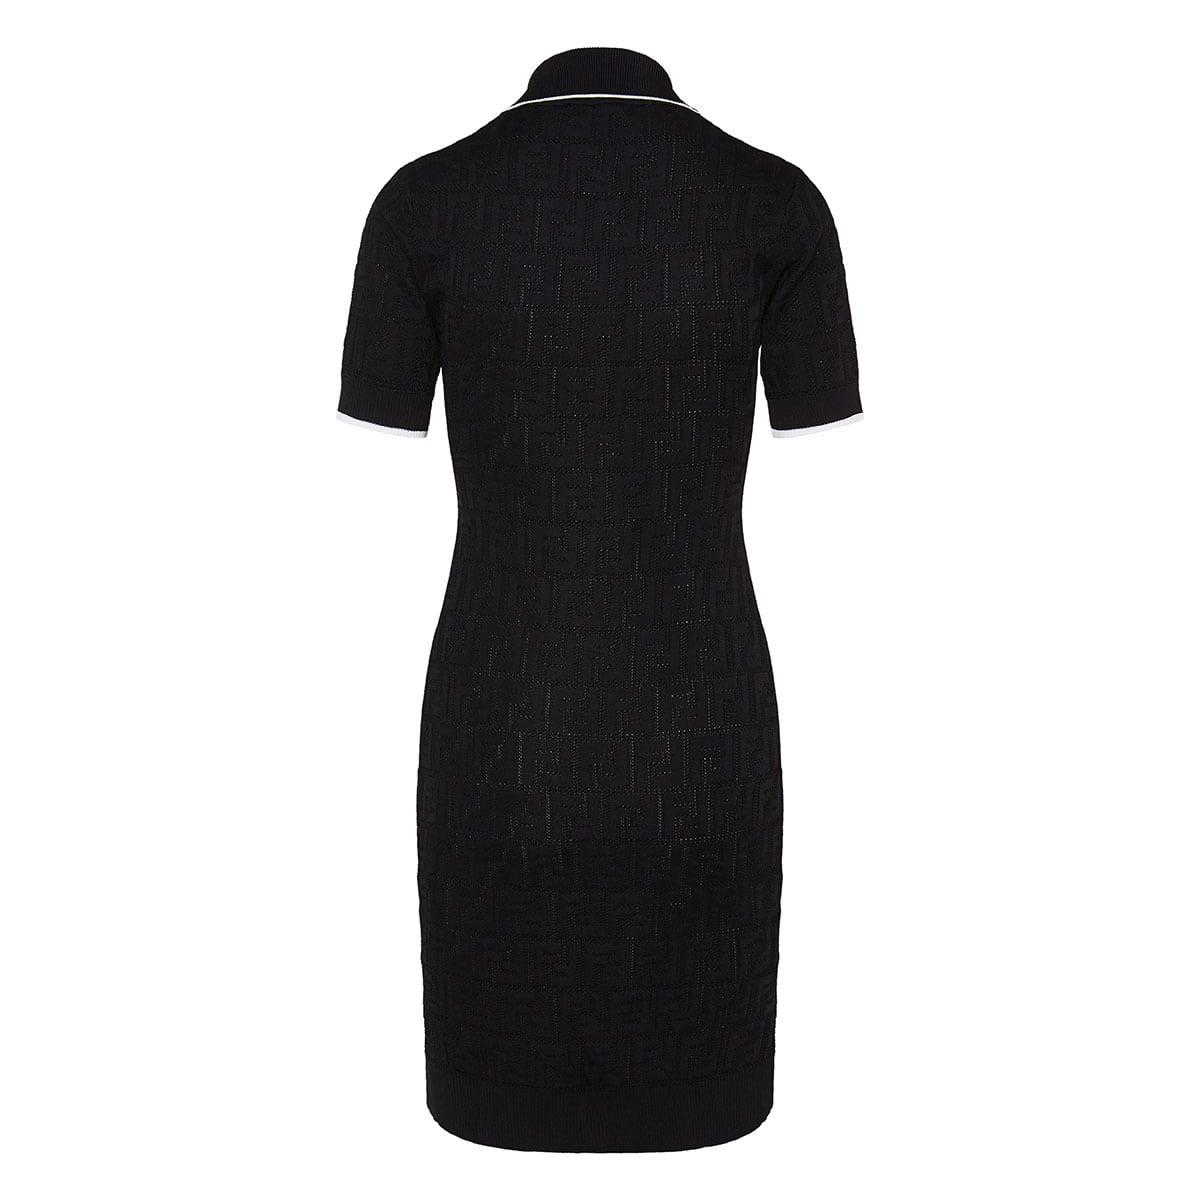 FF jacquard knitted dress